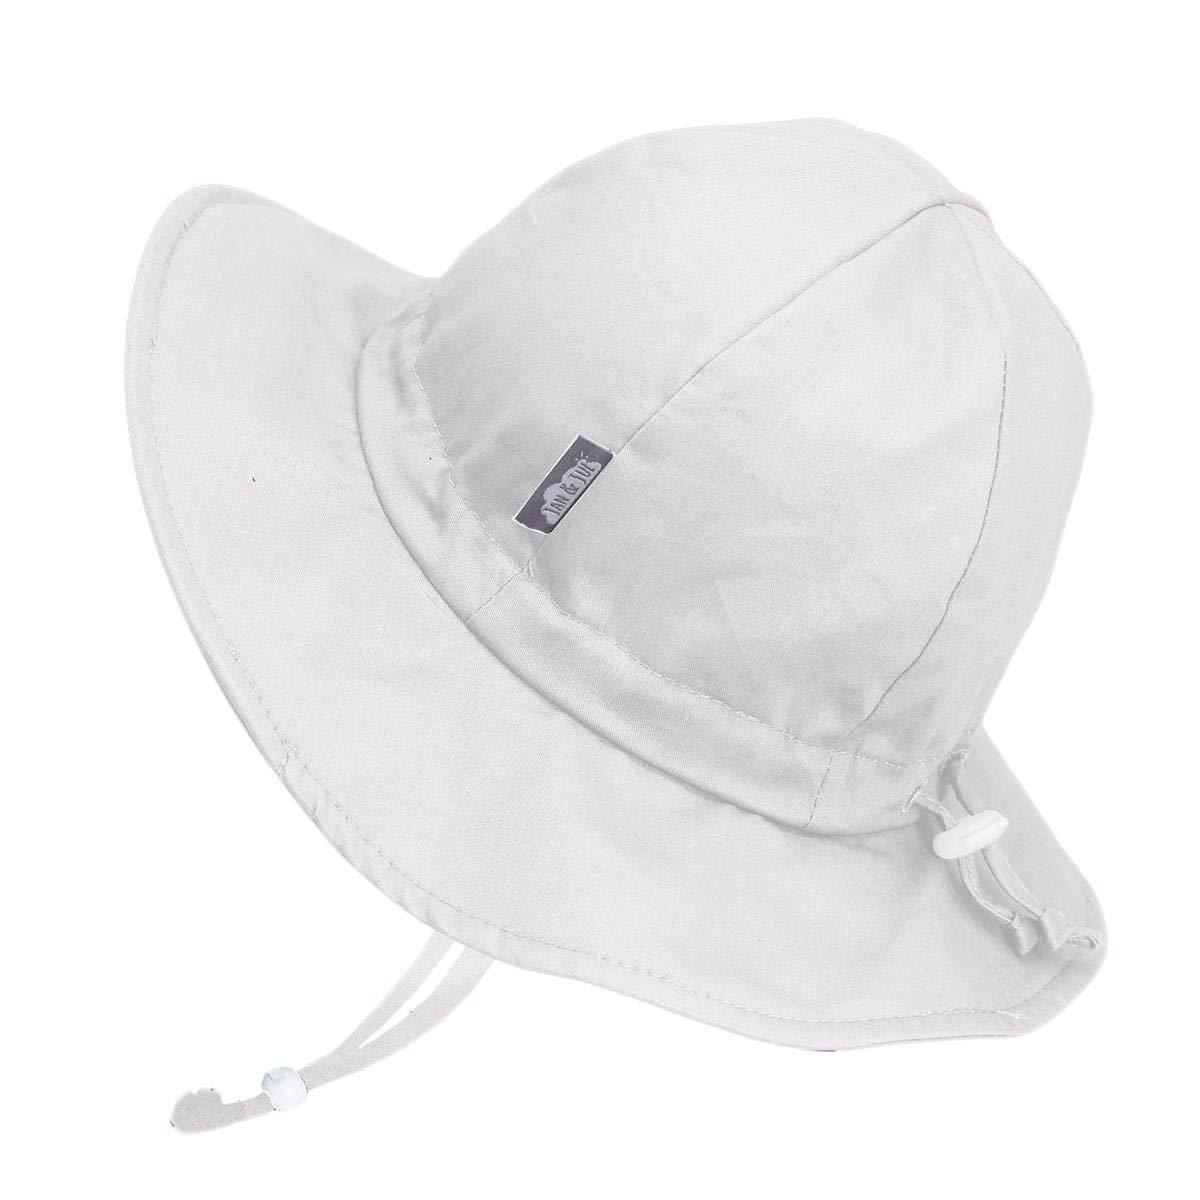 Kids Adjustable Strap for Baby Jan /& Jul Girls Wide Brim UV Protection Cotton Sun-Hat Toddler